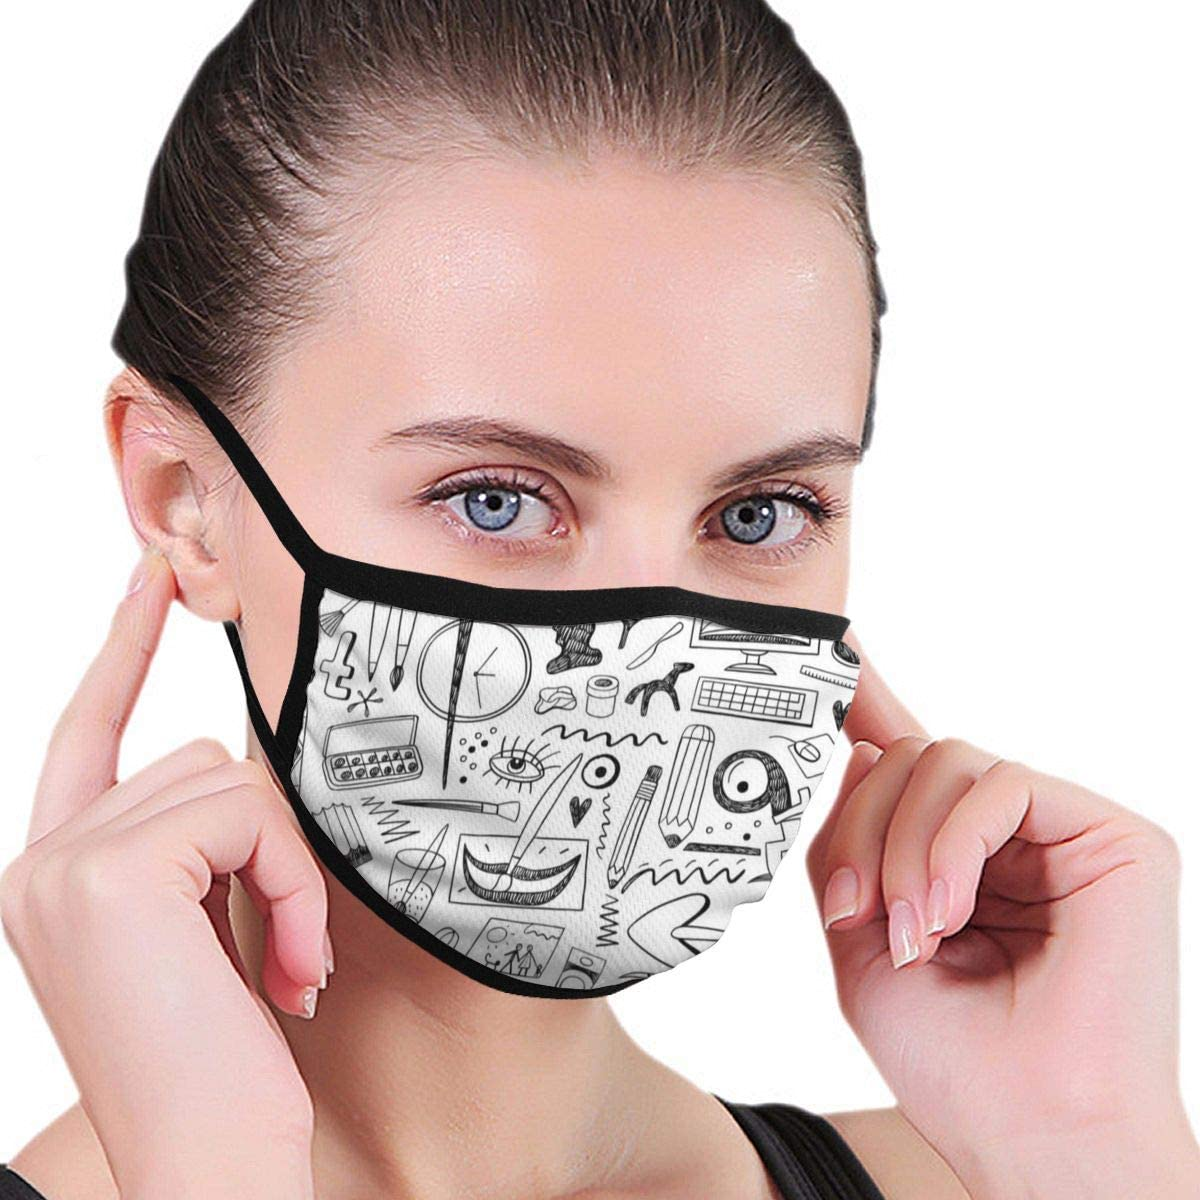 Herramientas de Arte Fondo Transparente Vector Image_1287Máscara Facial Unisex Negra Mascarilla antipolución Mascarilla Antipolvo Reutilizable Máscaras para Ciclismo Camping Travel